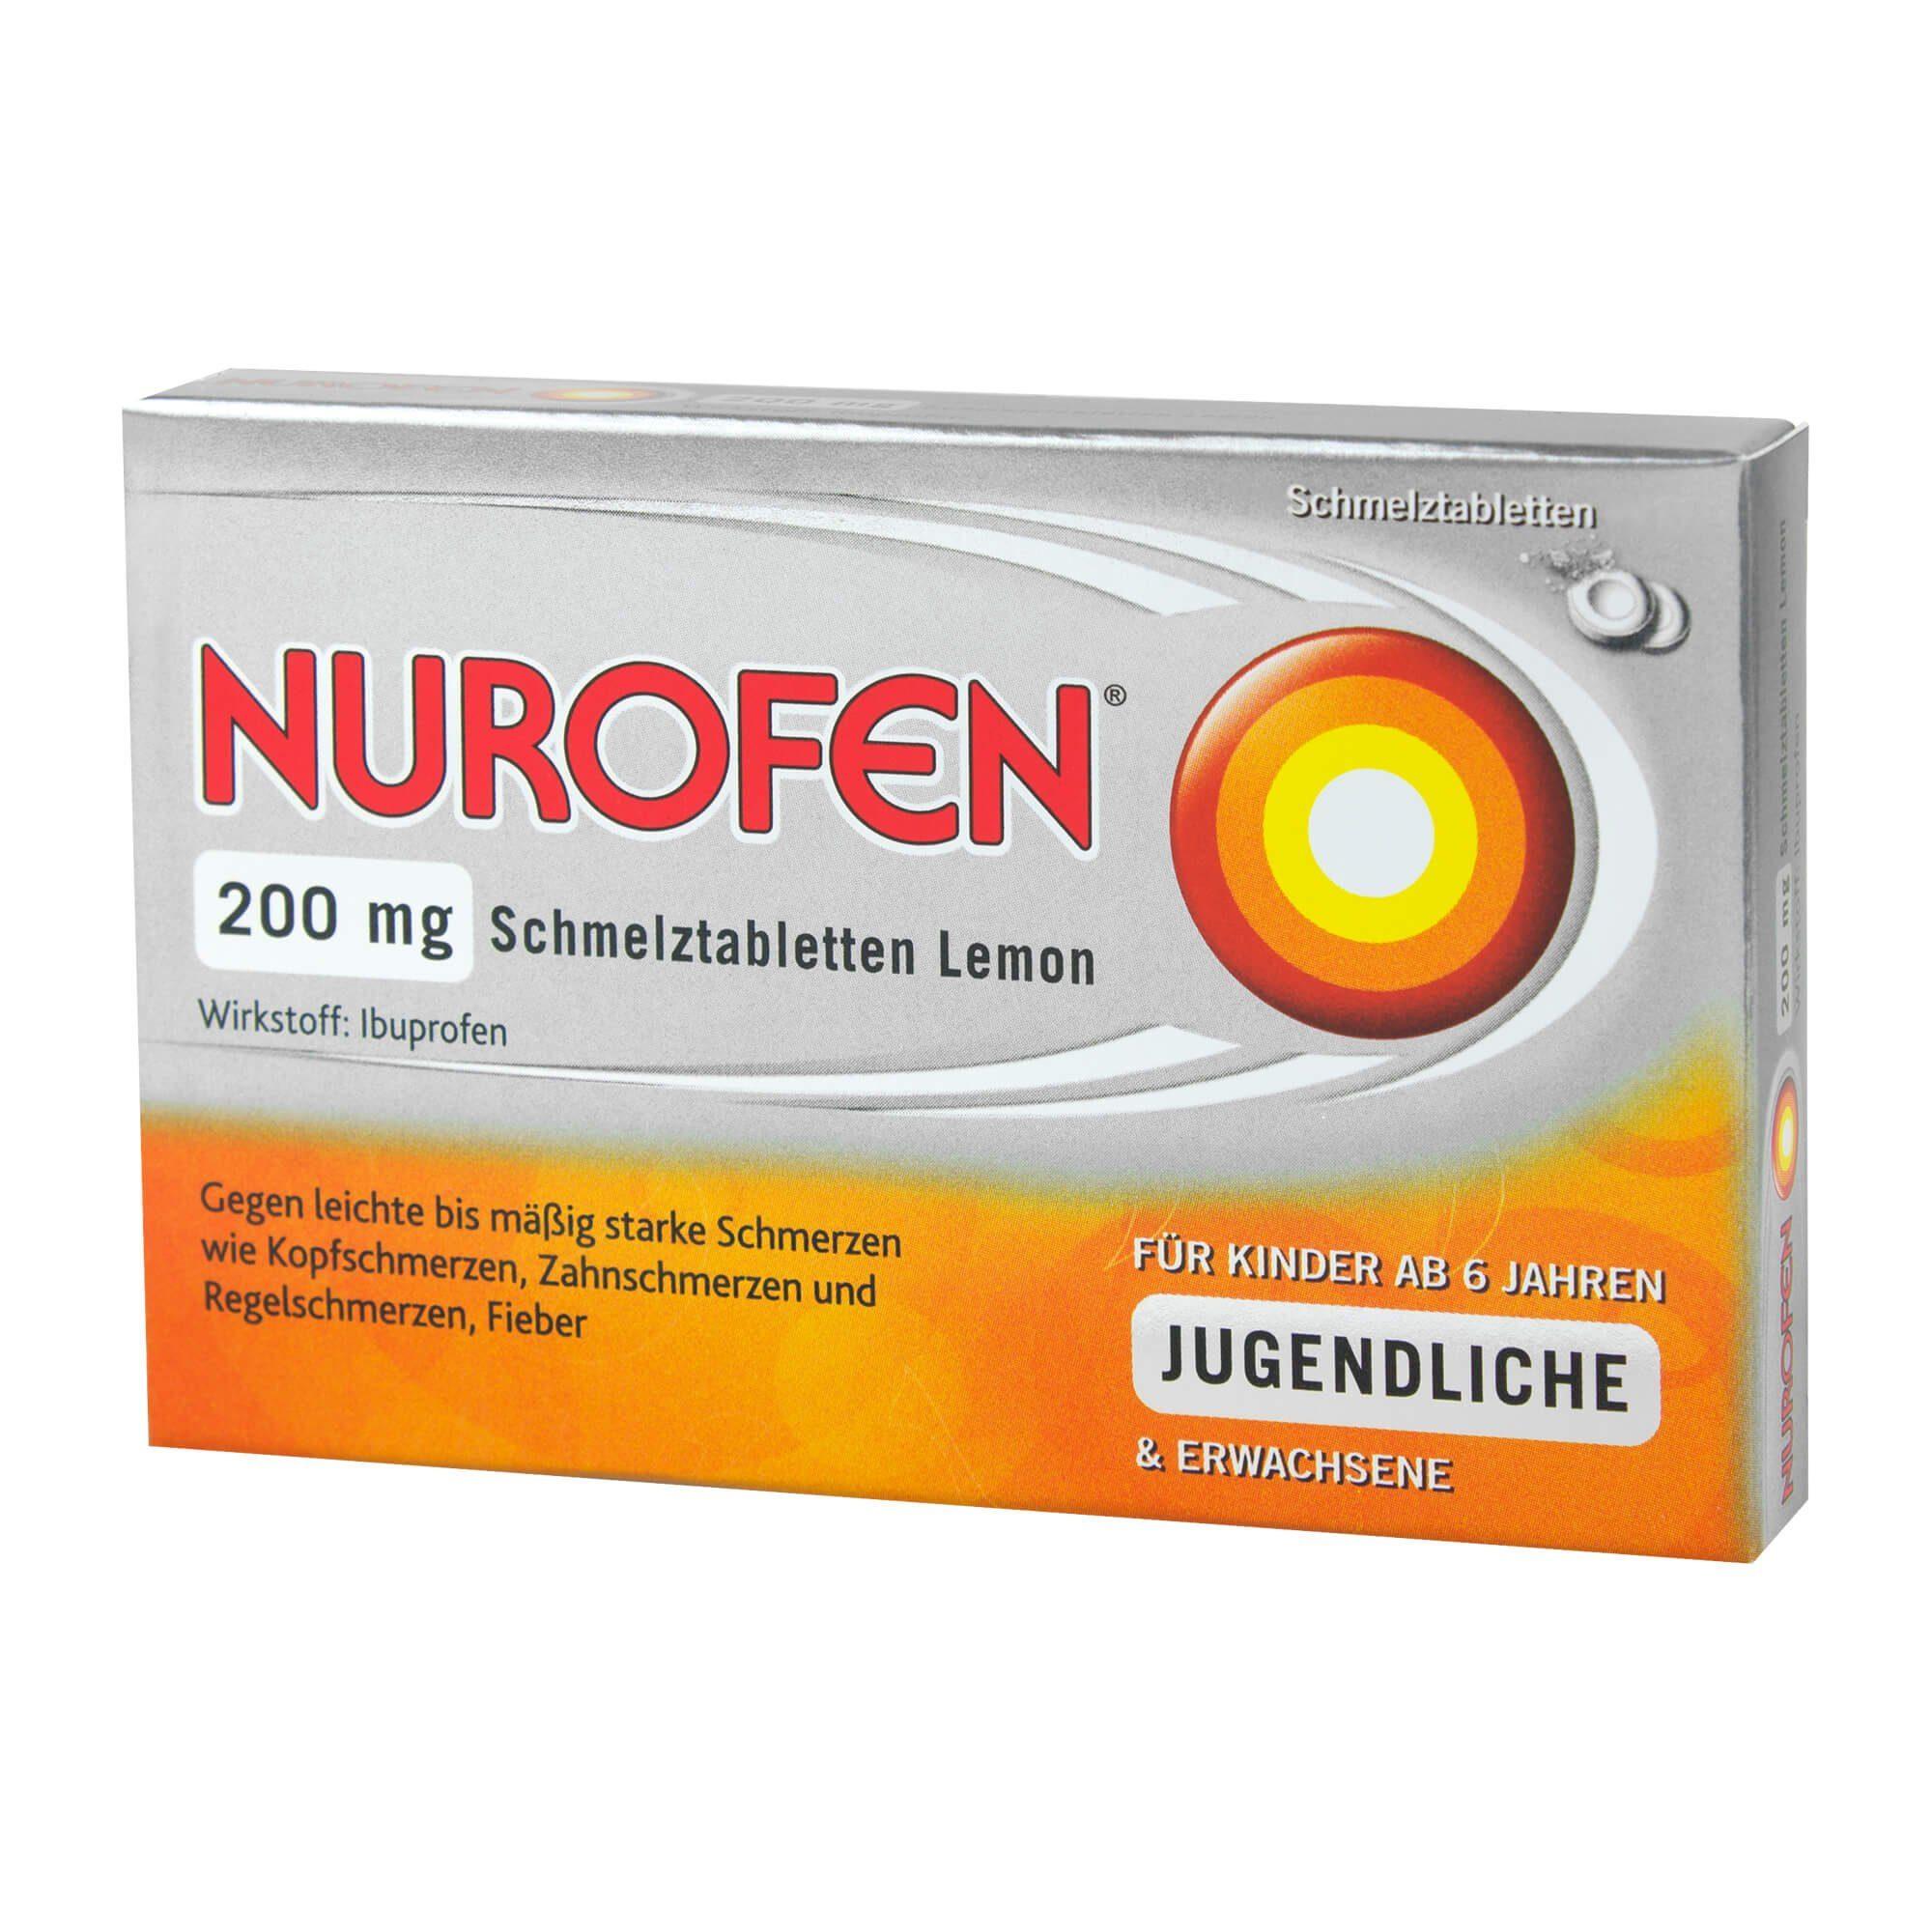 Nurofen 200 mg Schmelztabletten Lemon , 12 St